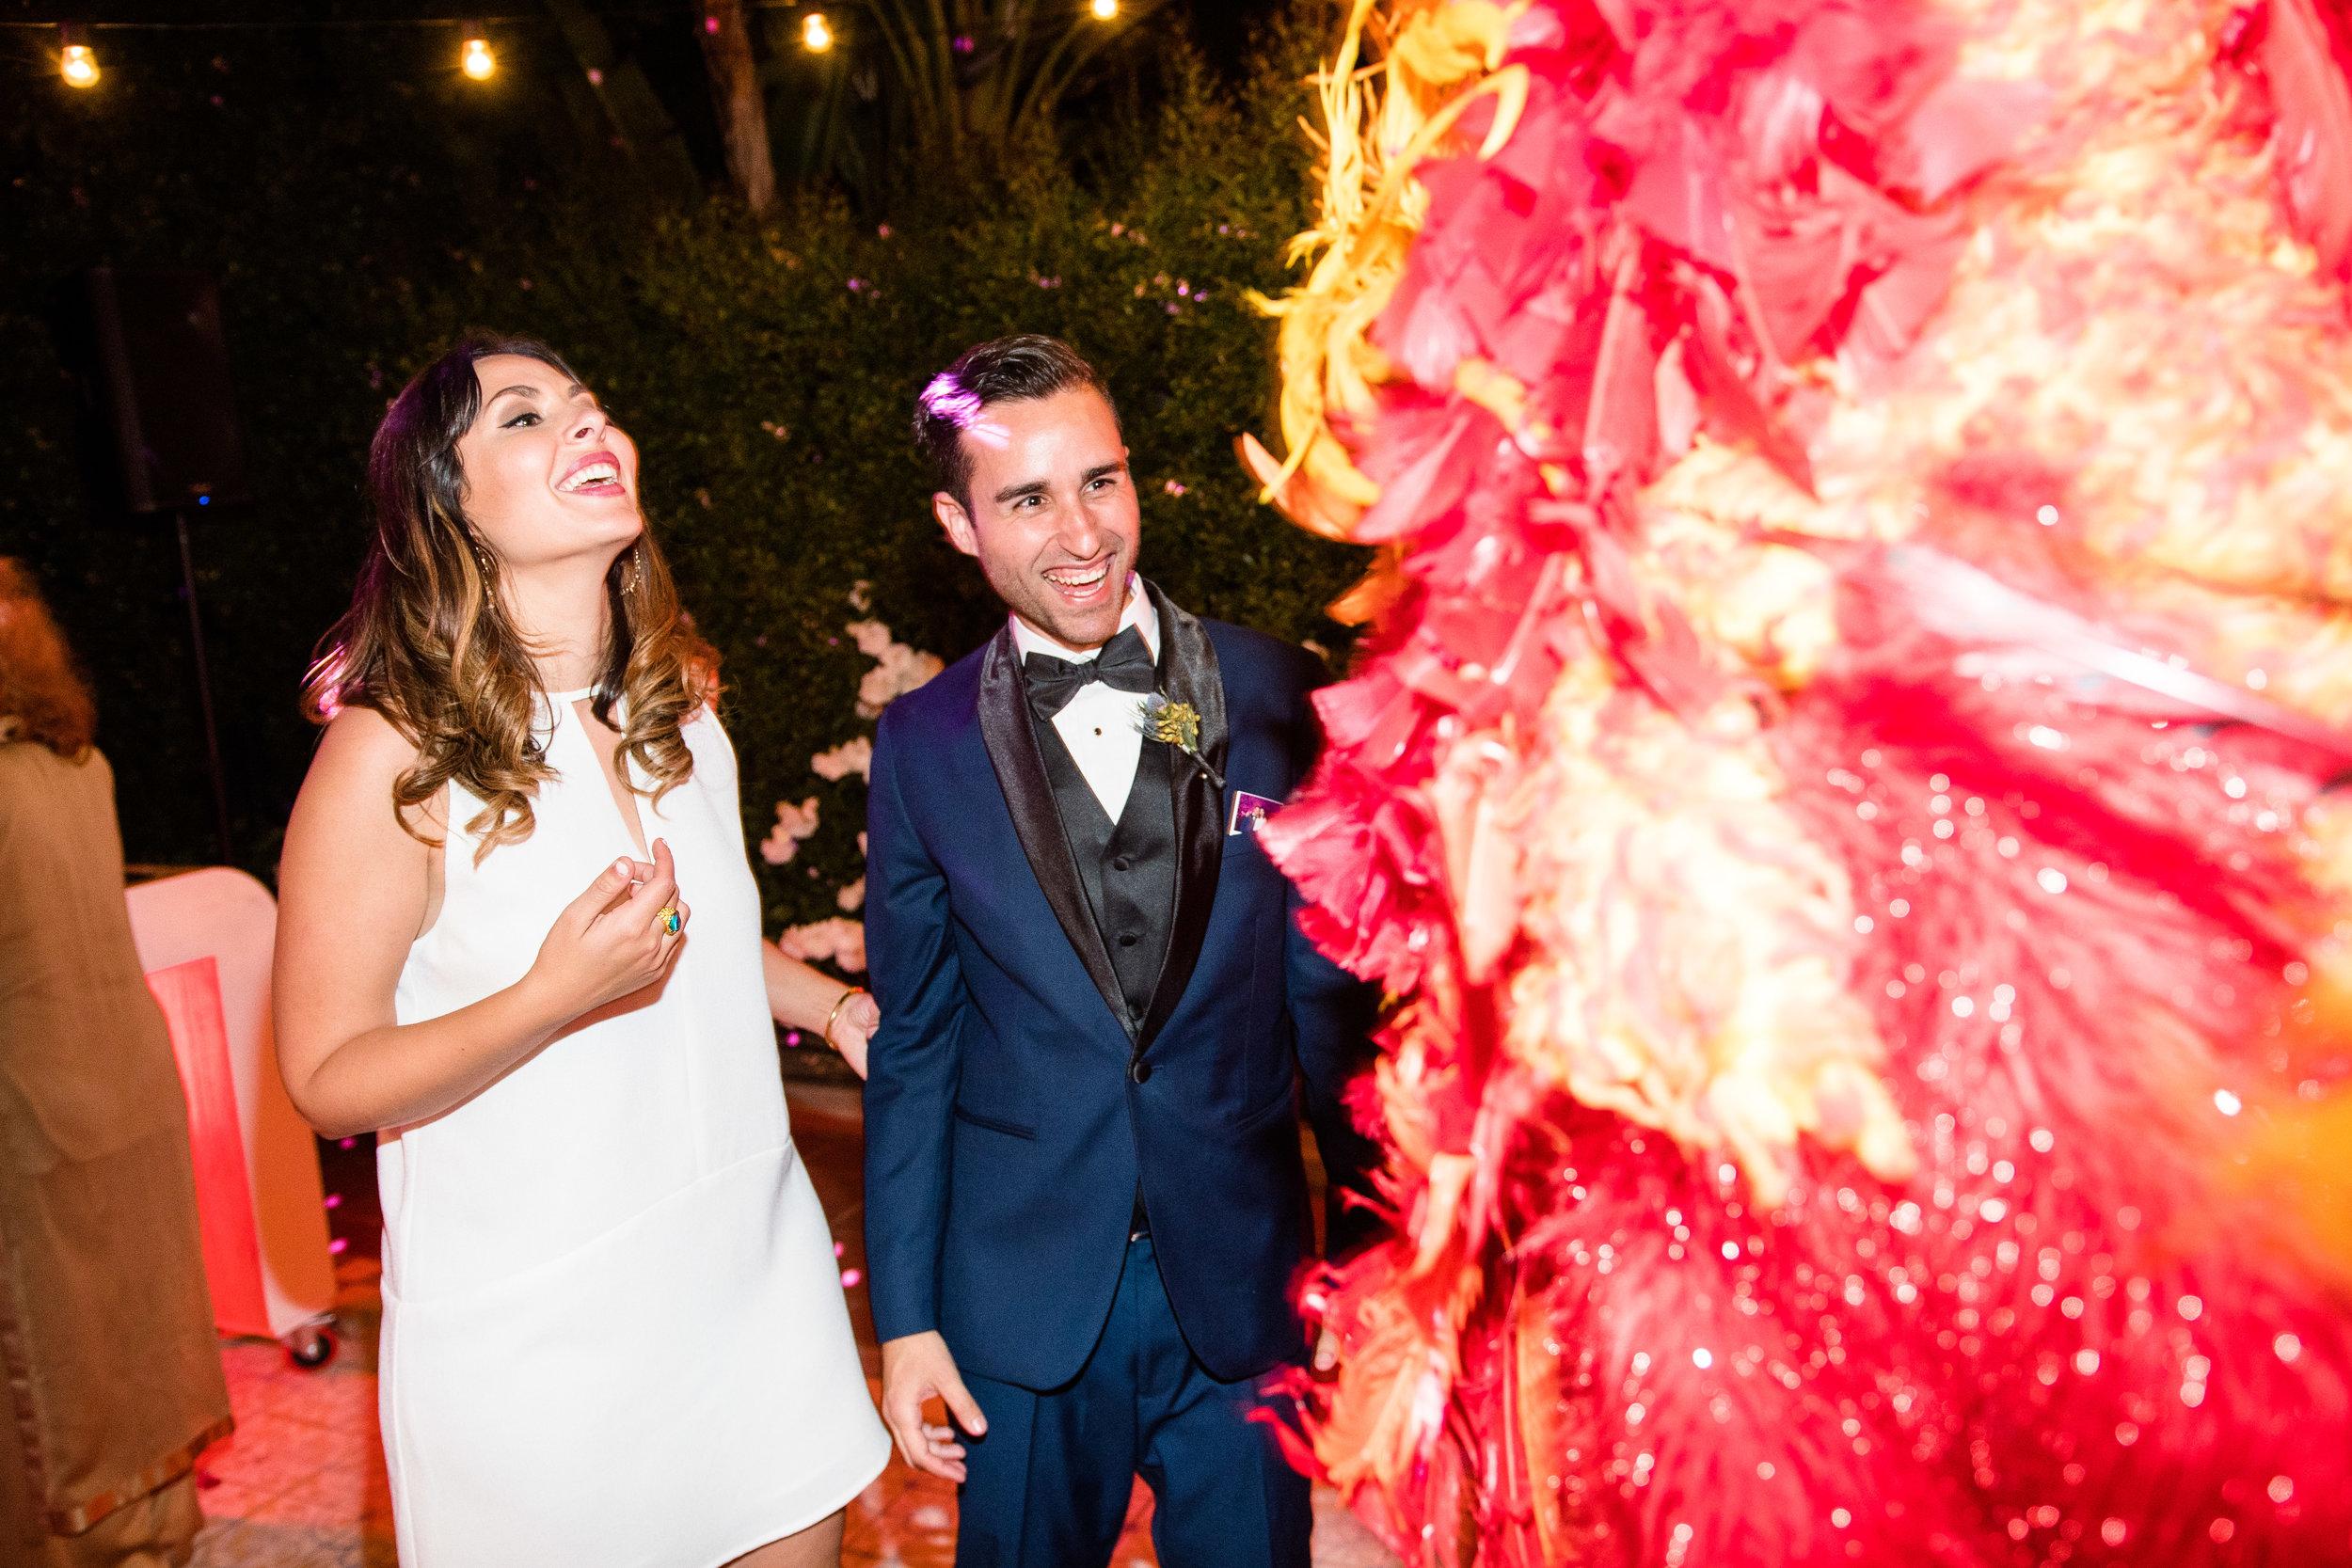 Vibrant Fiesta Backyard Wedding Reception bride and groom wiht miss fuego.jpg